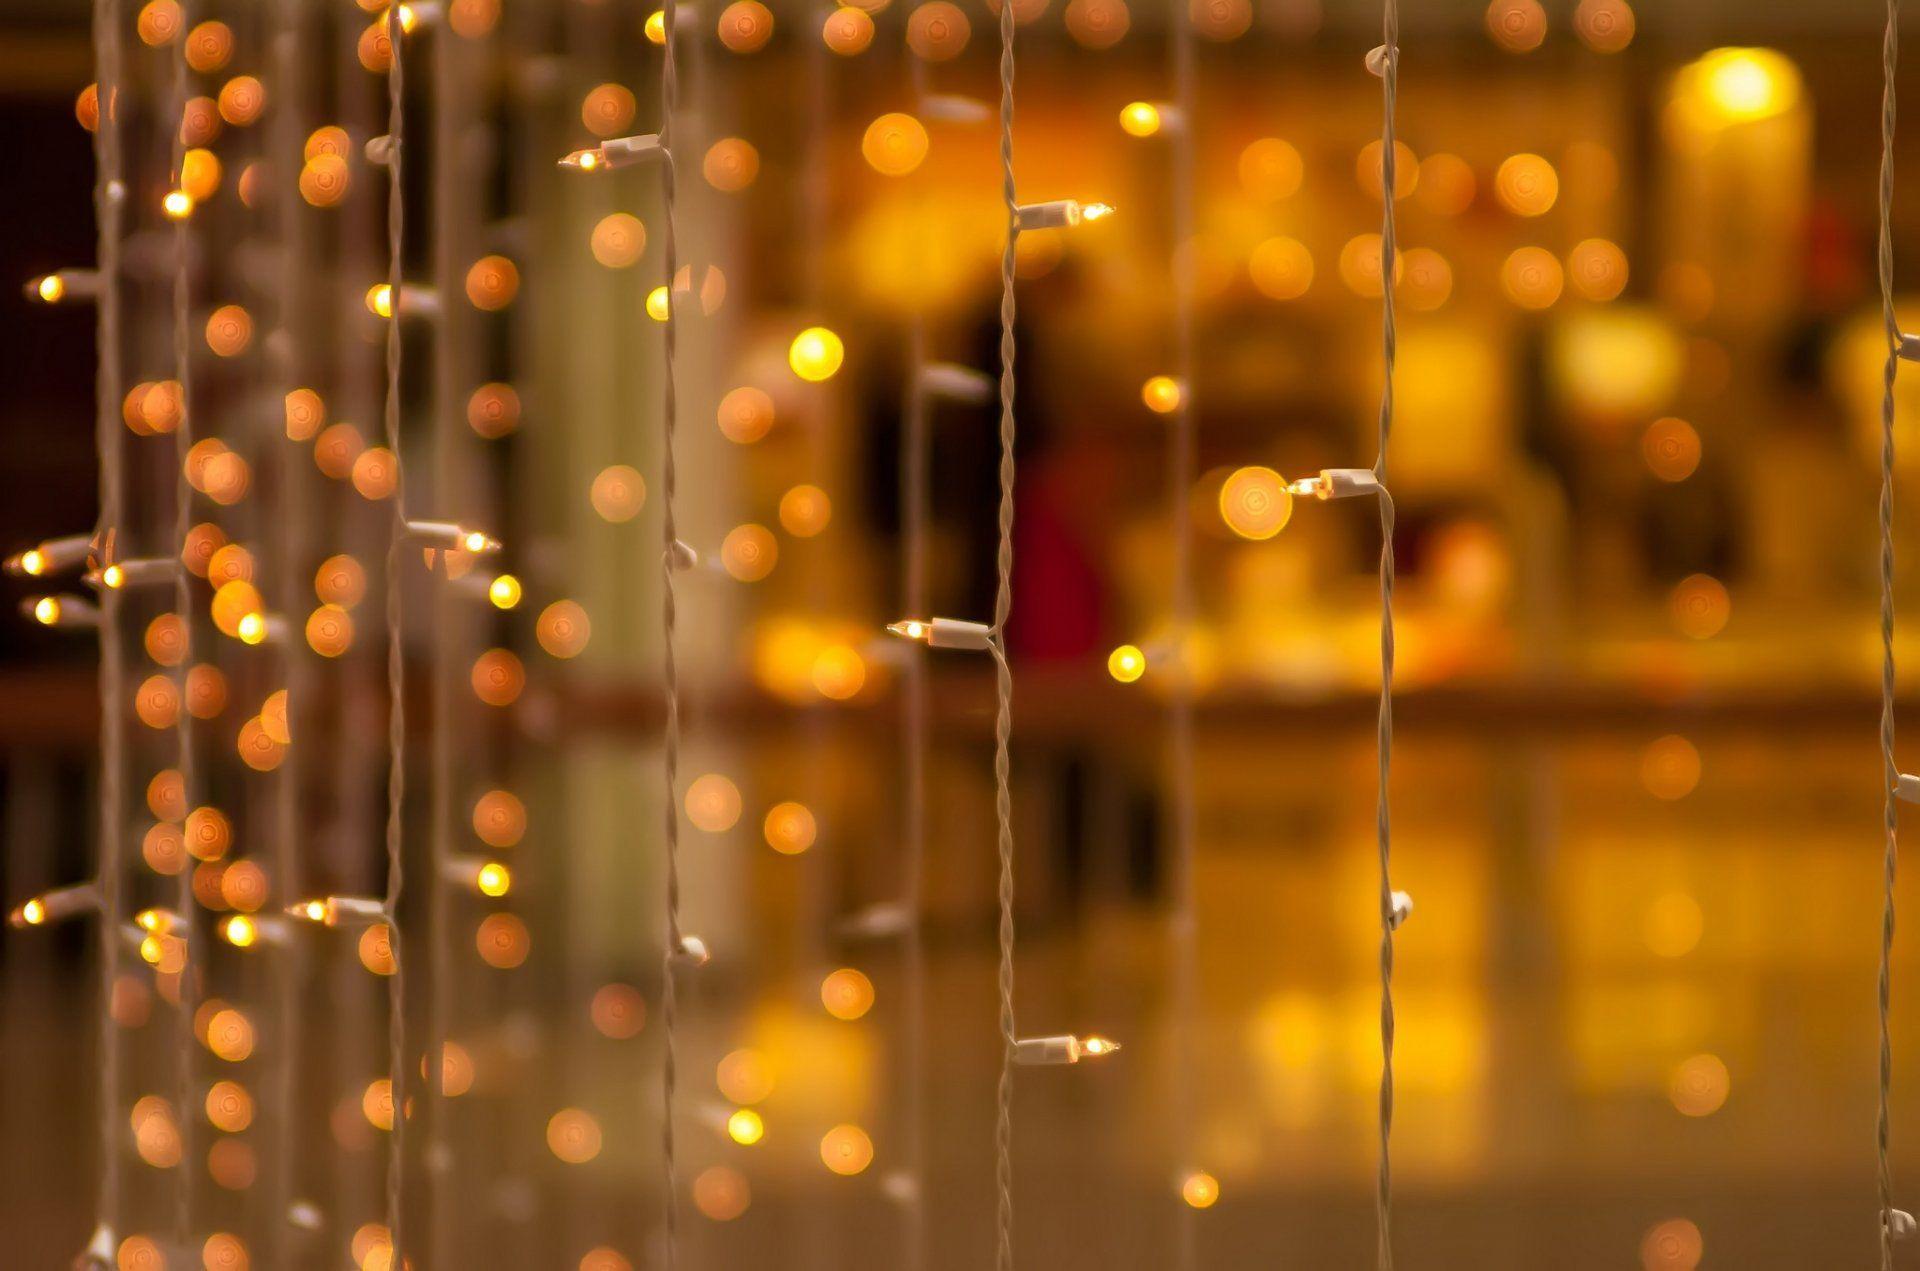 Shubham 3d Wallpaper Close Up Garland Bulbs Bokeh Yellow Blur Bokeh Decoration